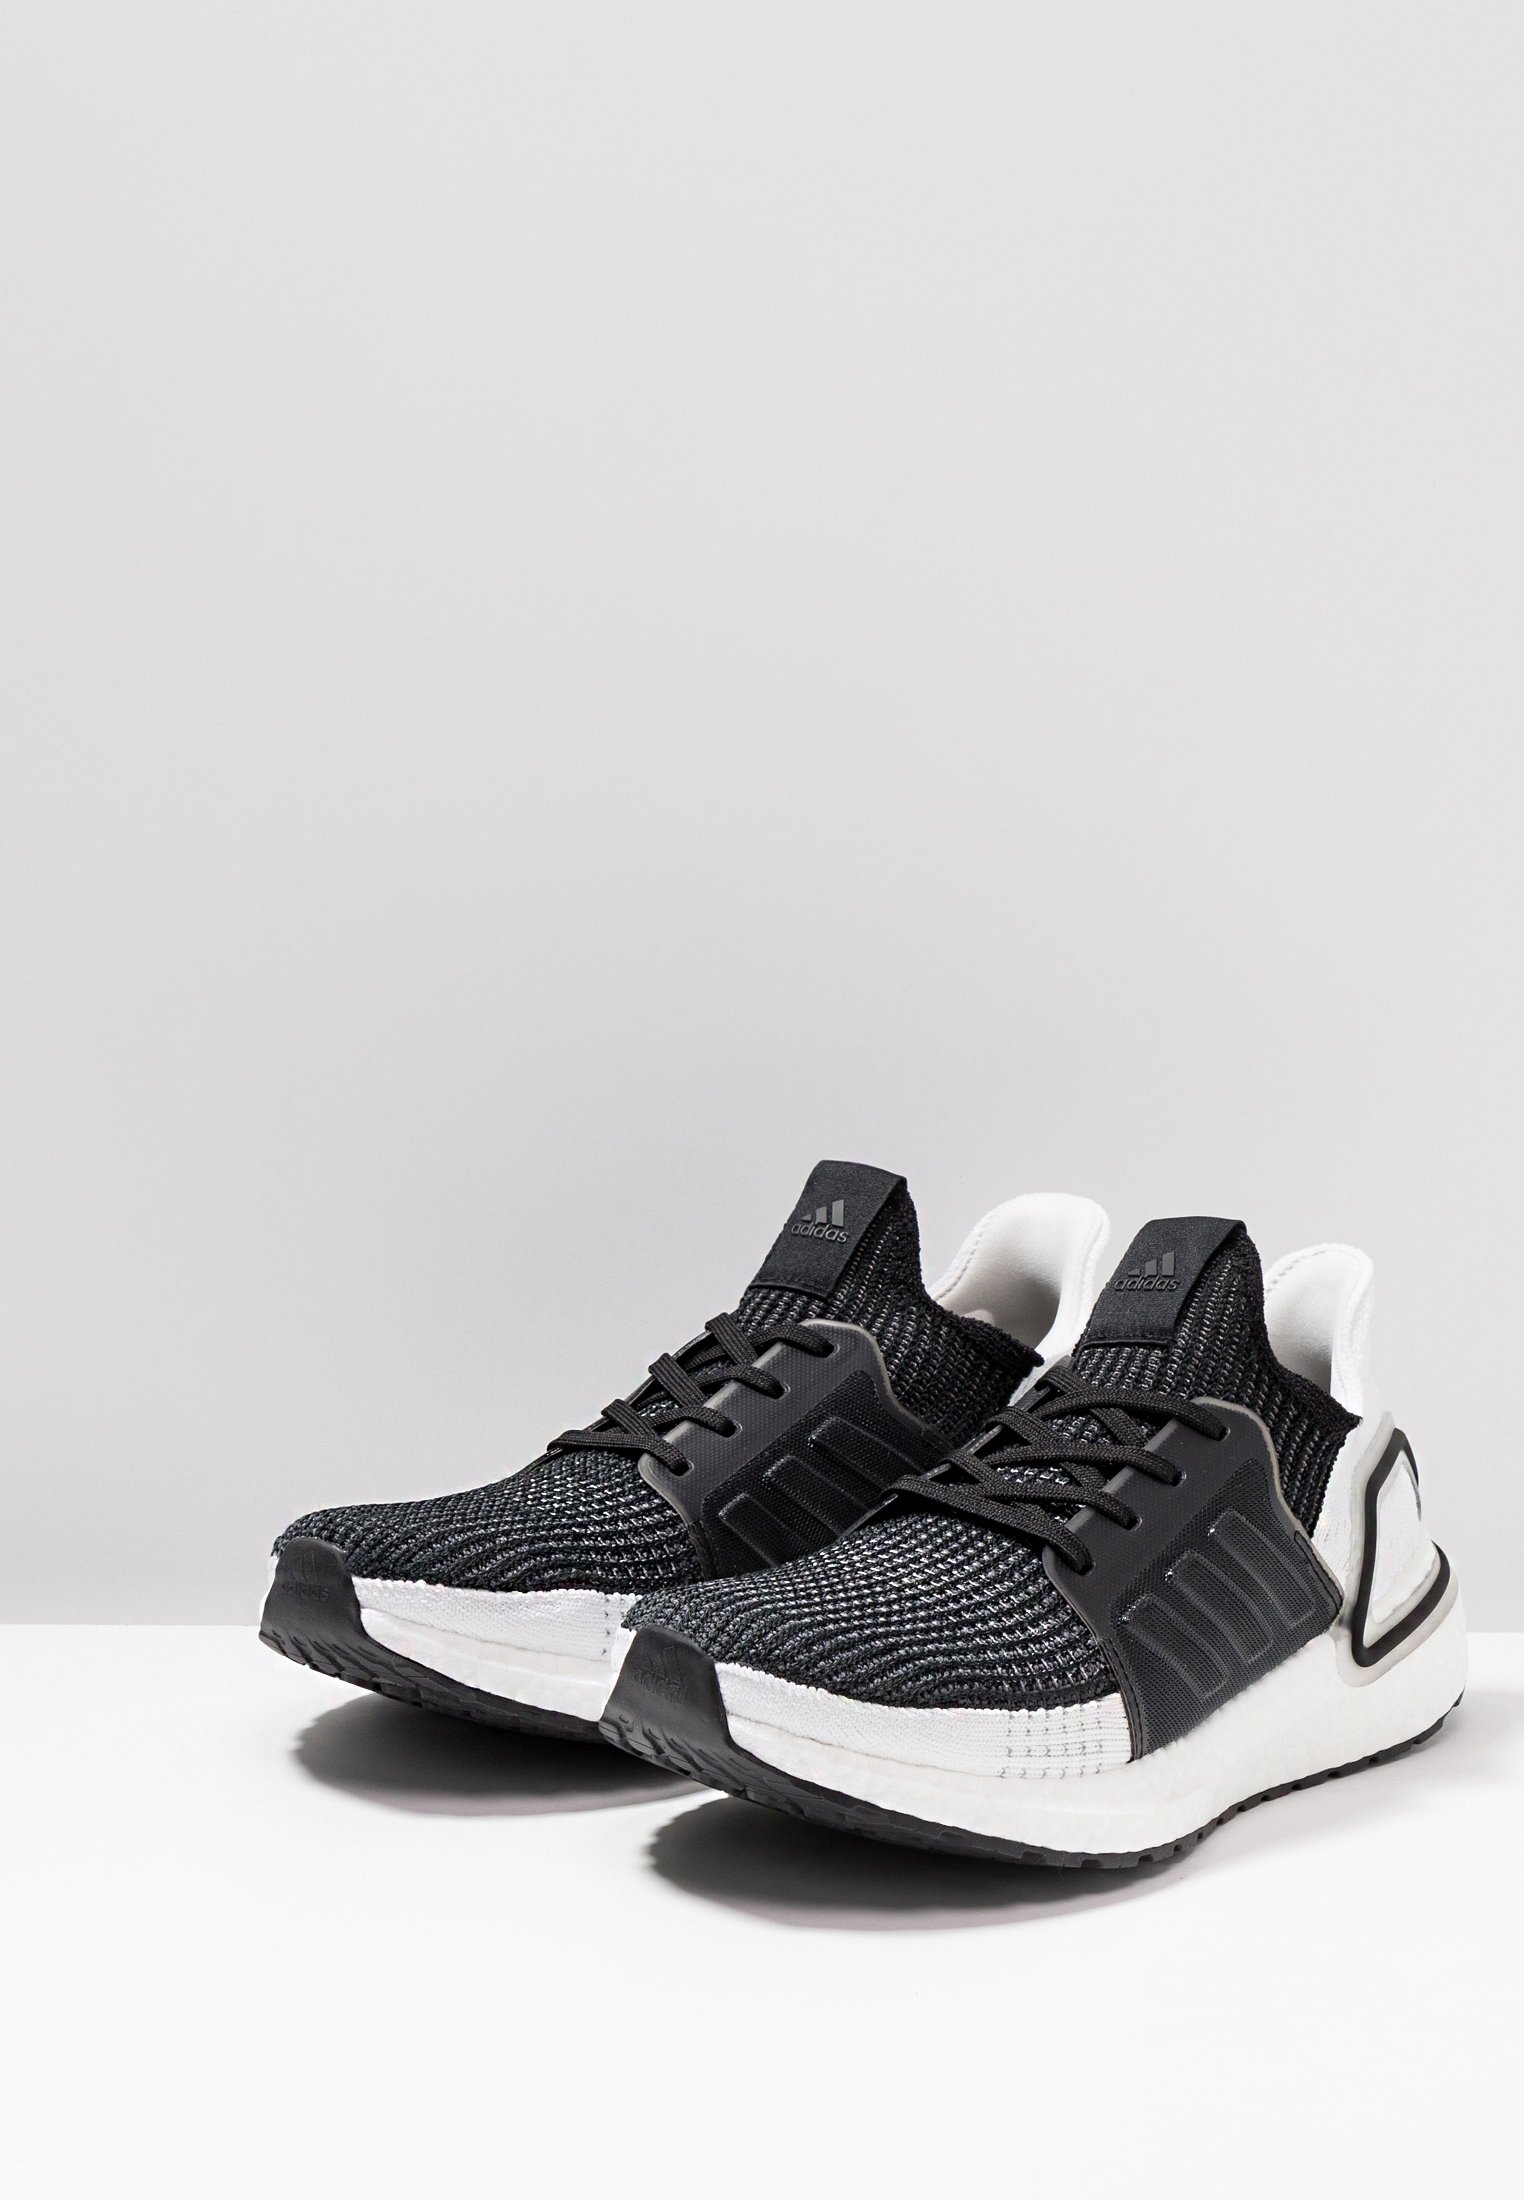 Black grey De Adidas Performance Running Ultraboost Six grey Neutres Core Four 19Chaussures kZiOXPu